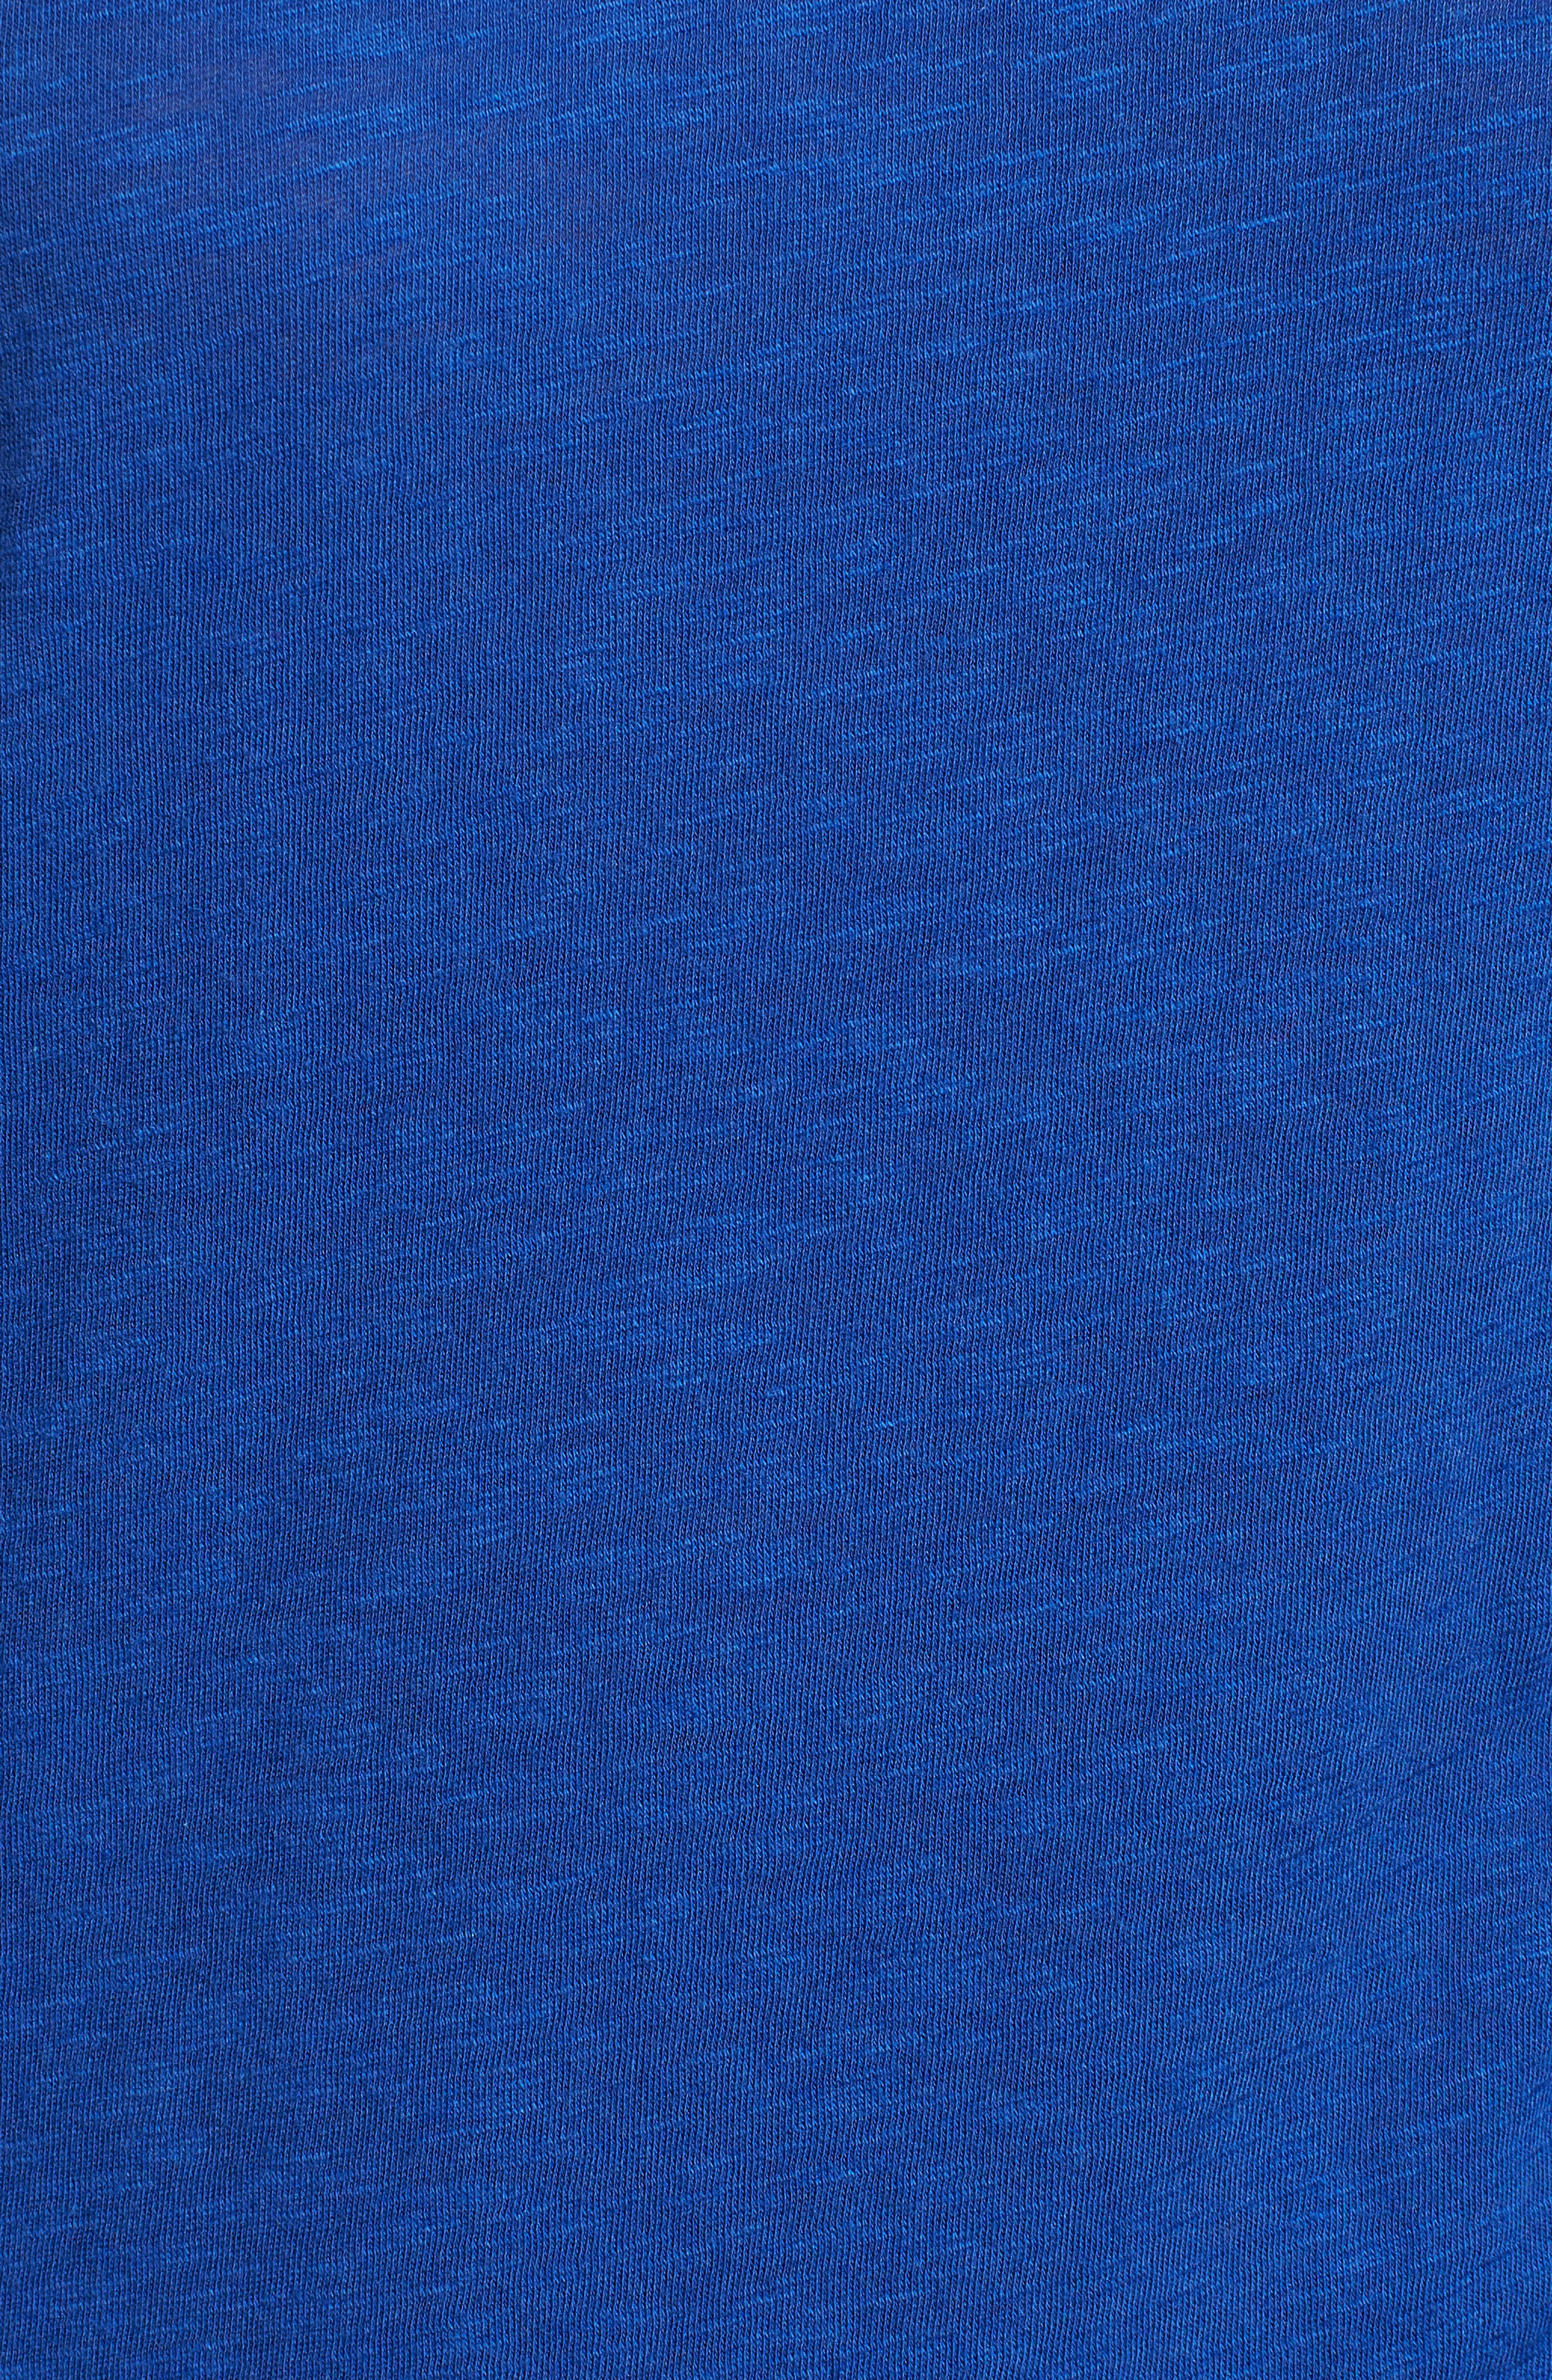 Long Sleeve Crewneck Tee,                             Alternate thumbnail 7, color,                             BLUE MAZARINE